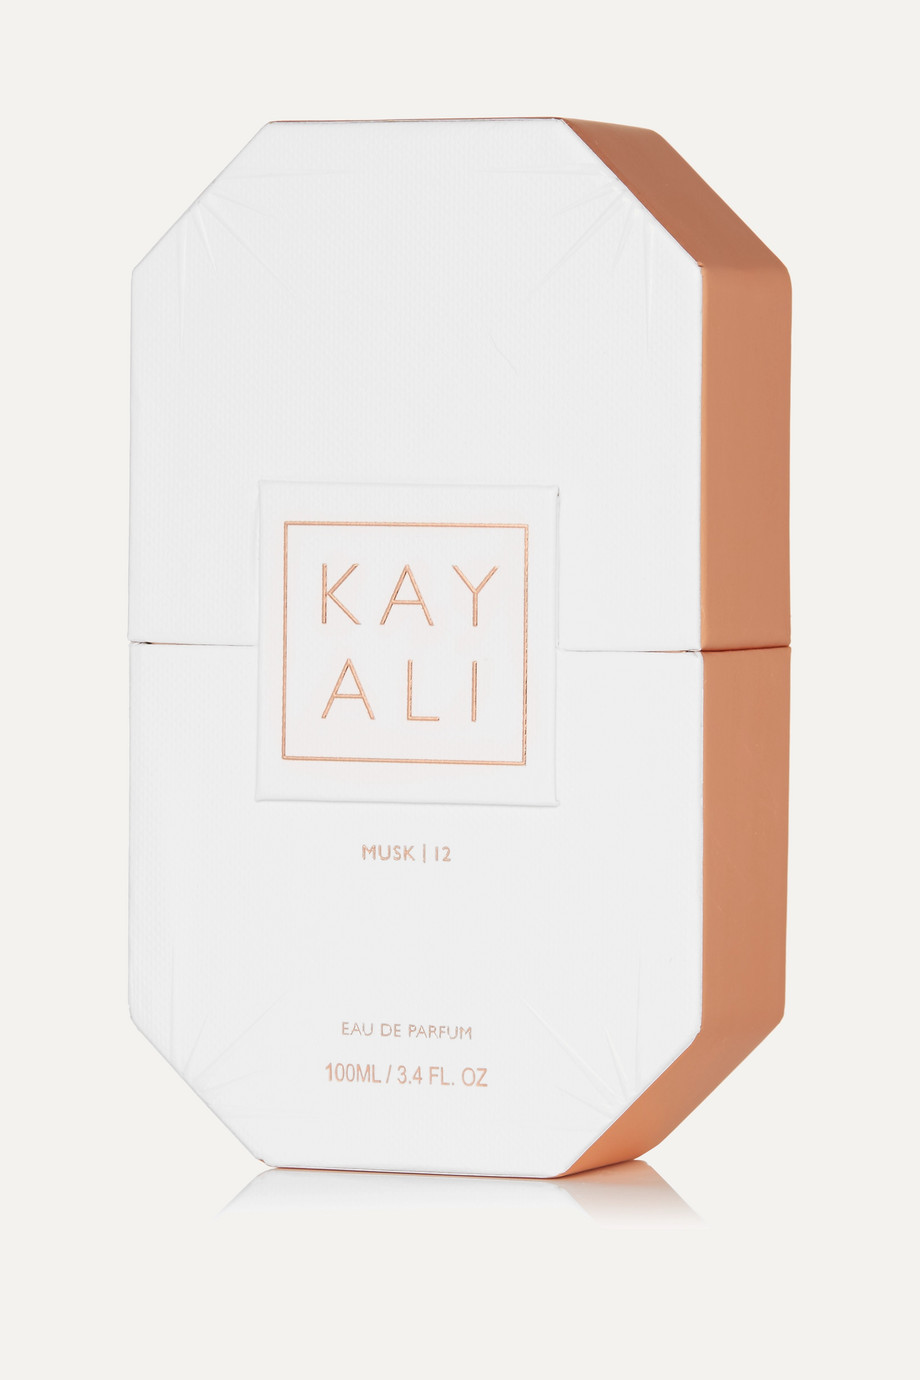 Huda Beauty Kayali Eau de Parfum - Musk 12, 100ml